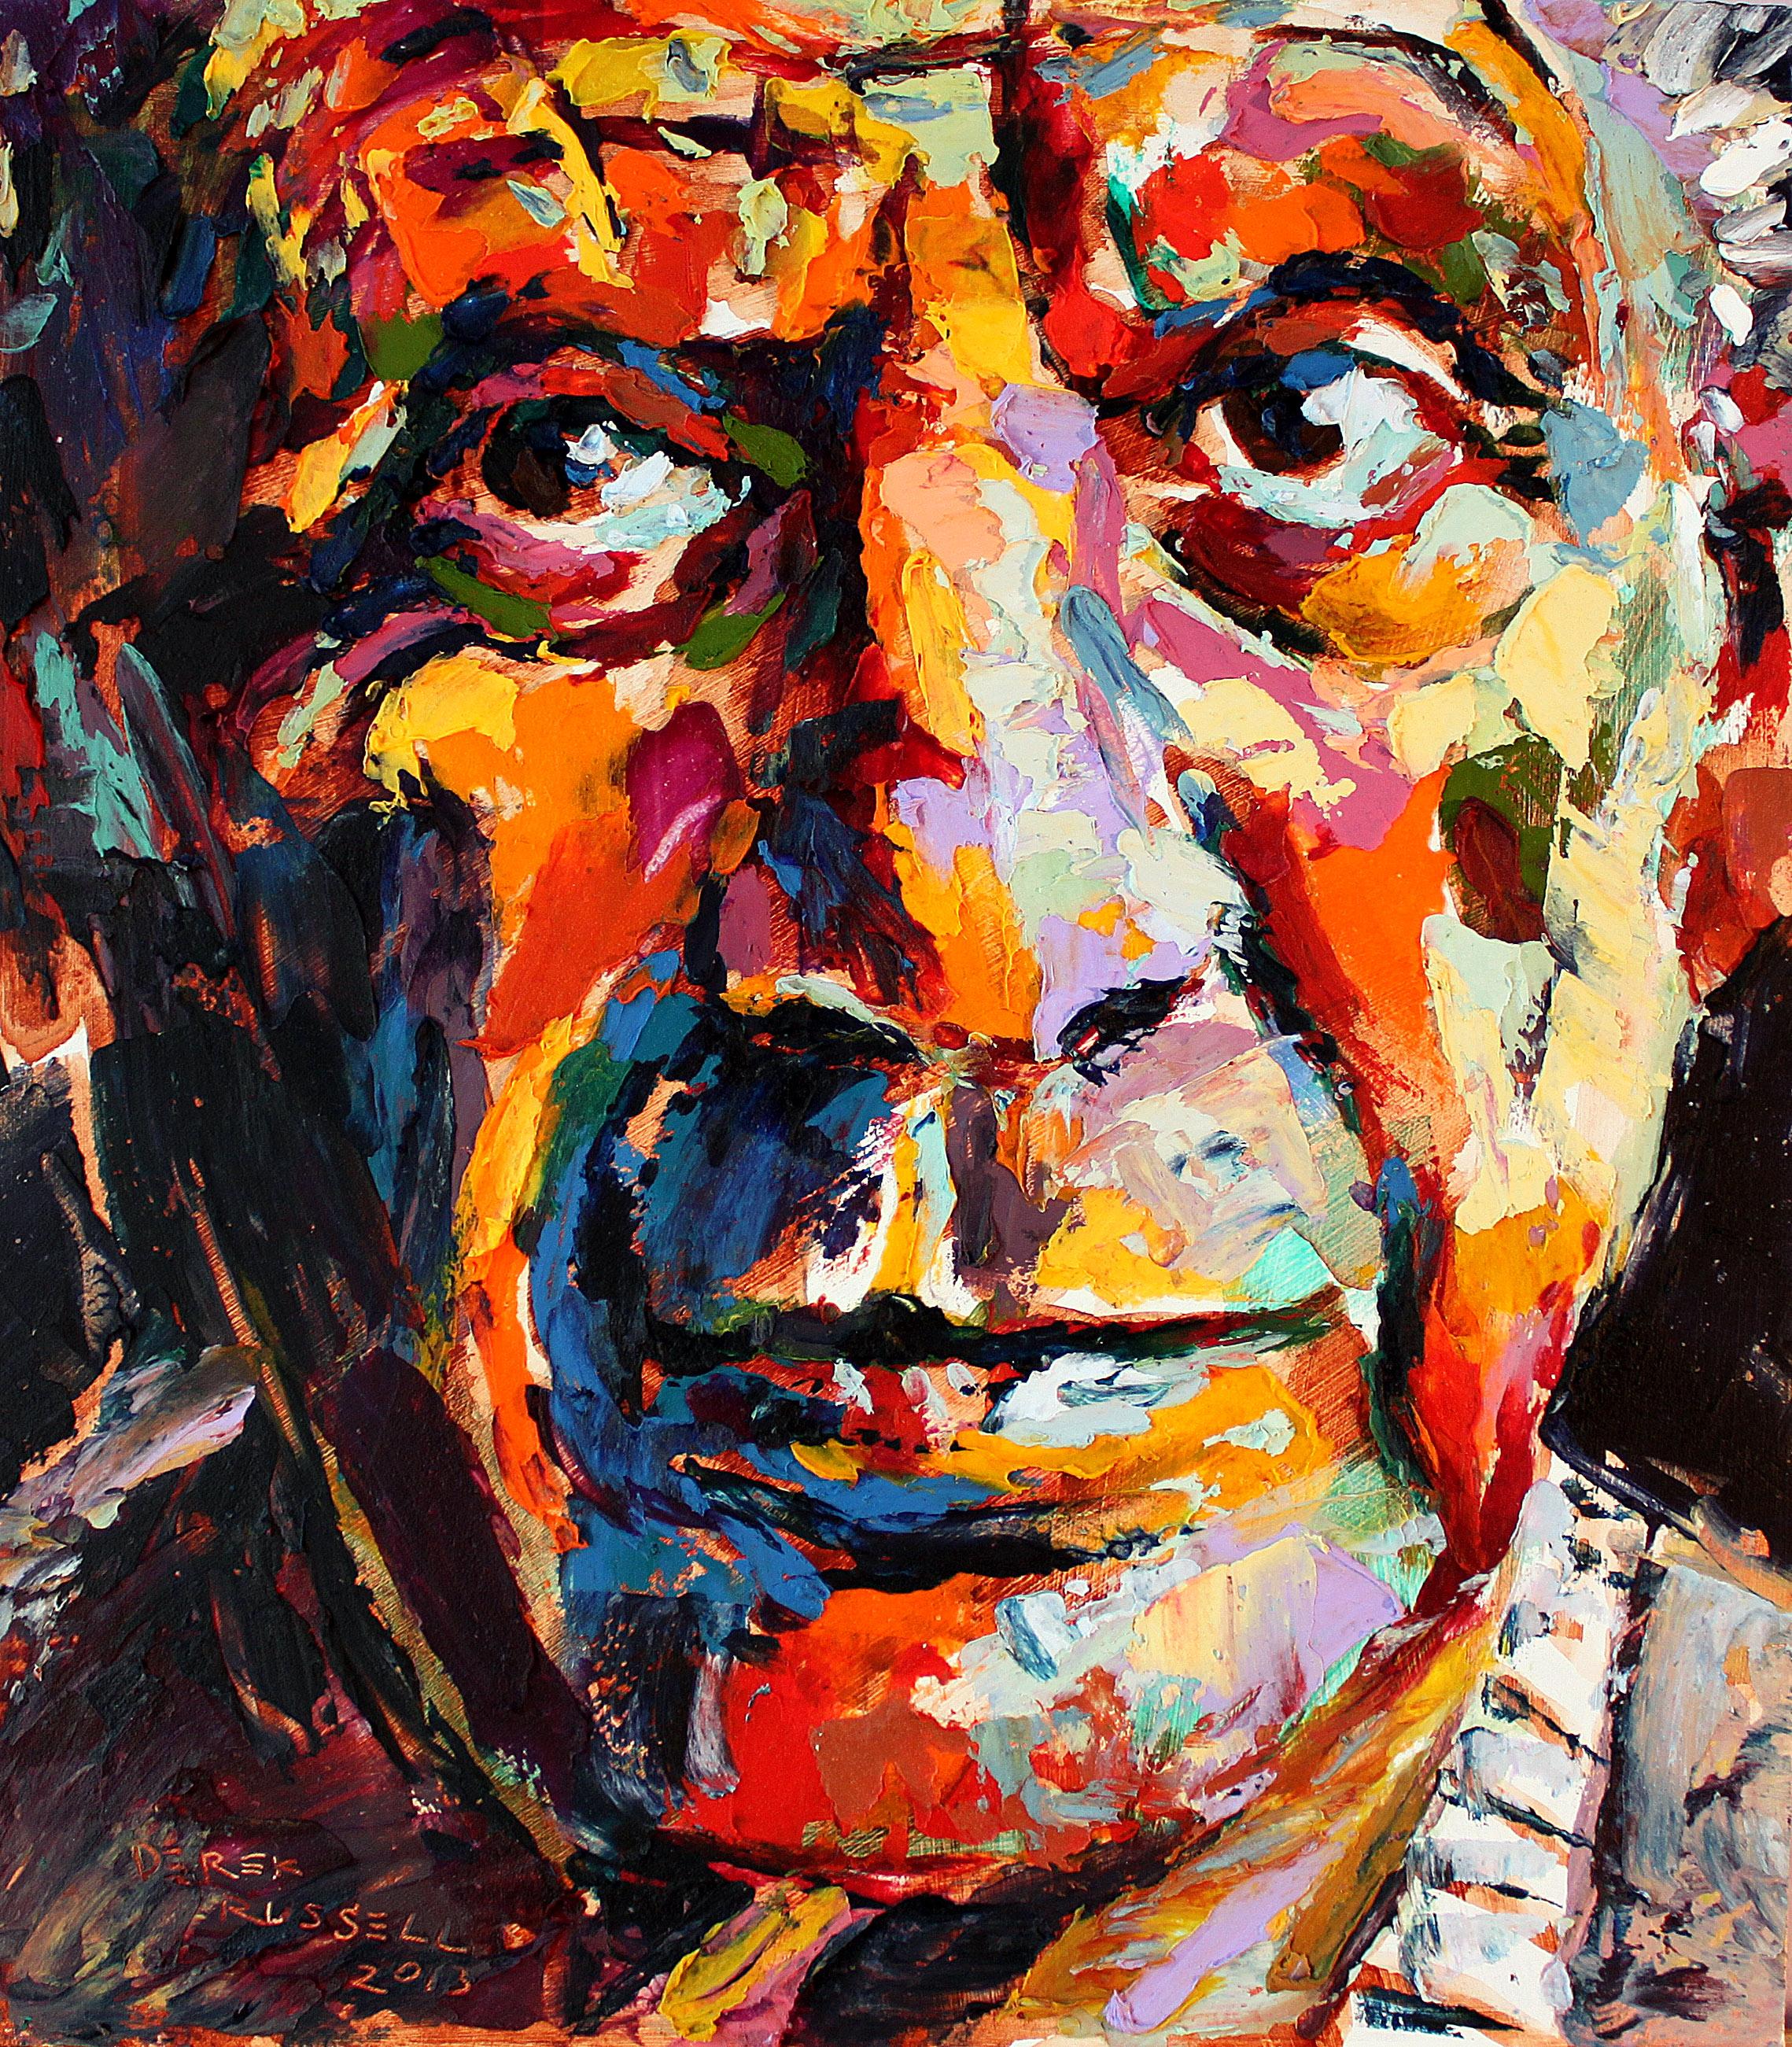 Pablo Picasso Original Pop Portrait Painting by Derek Russell